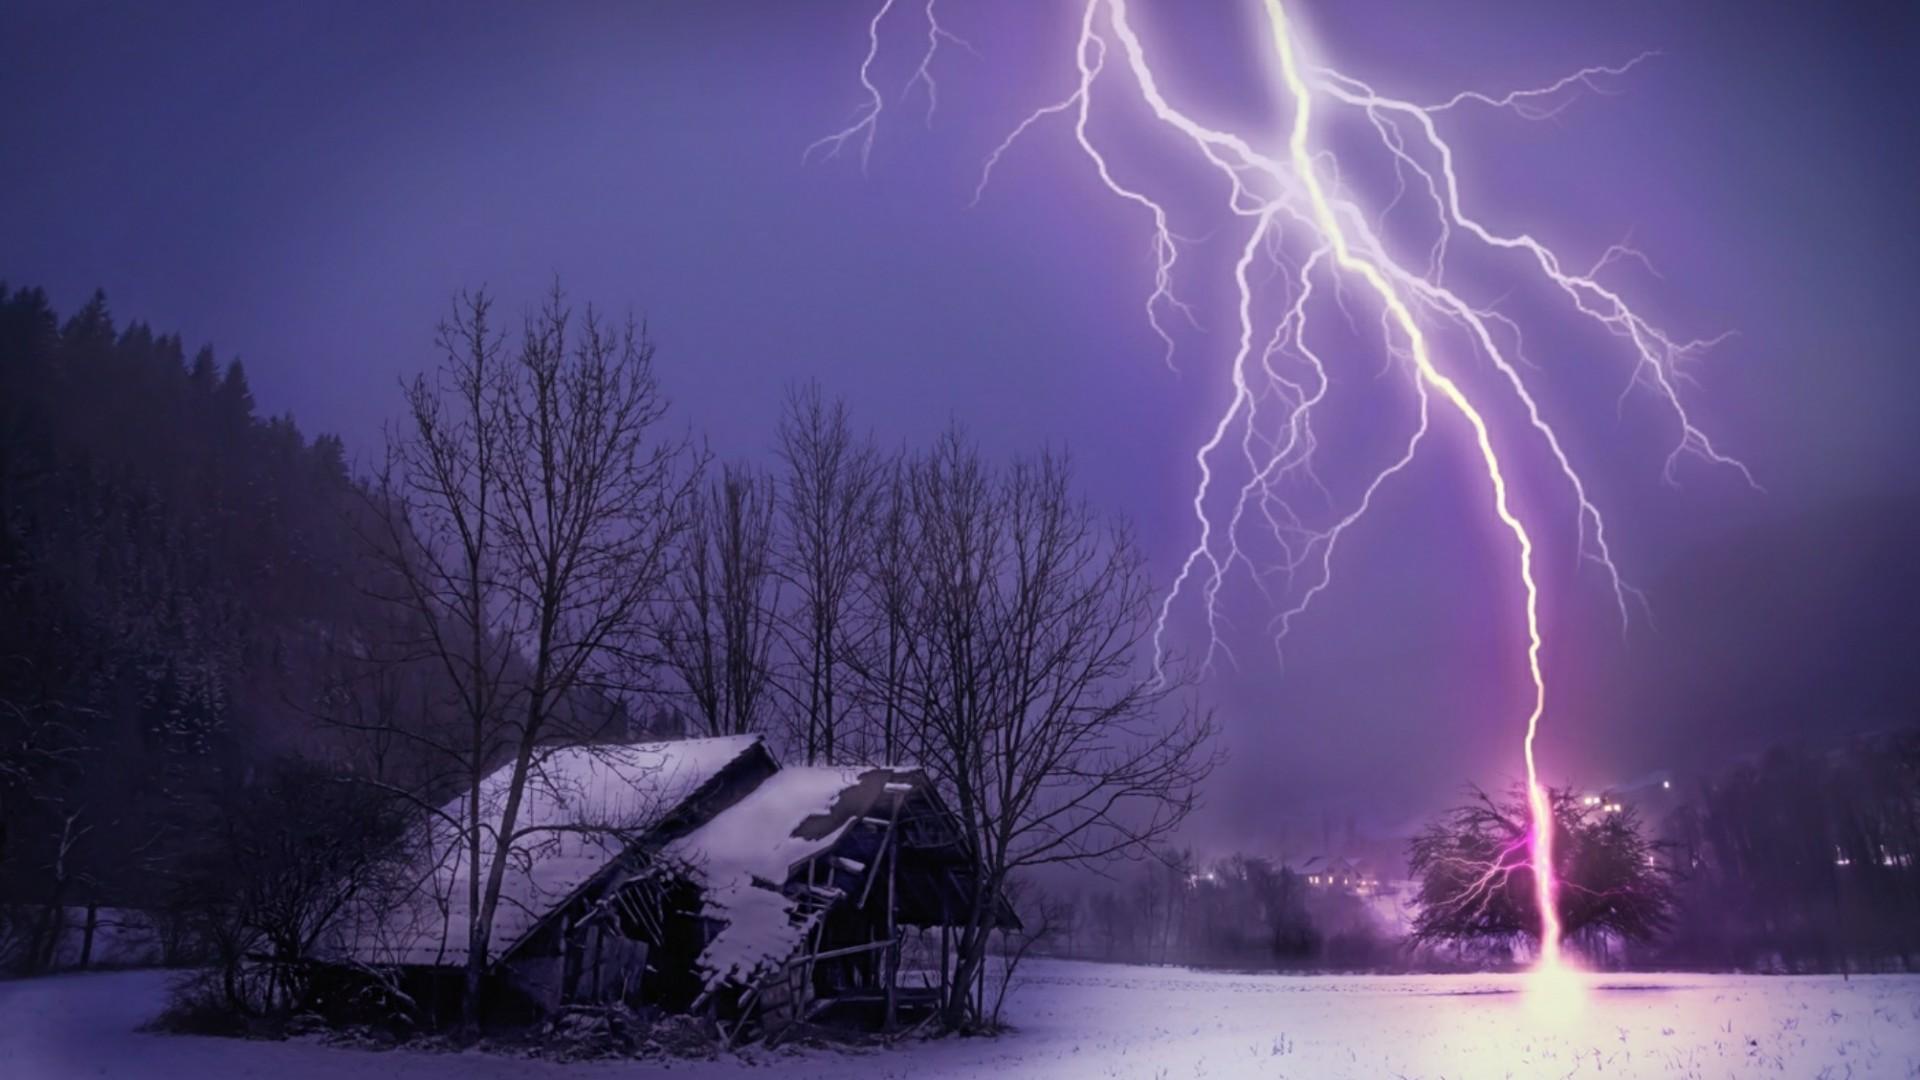 Lightning strike in winter wallpaper